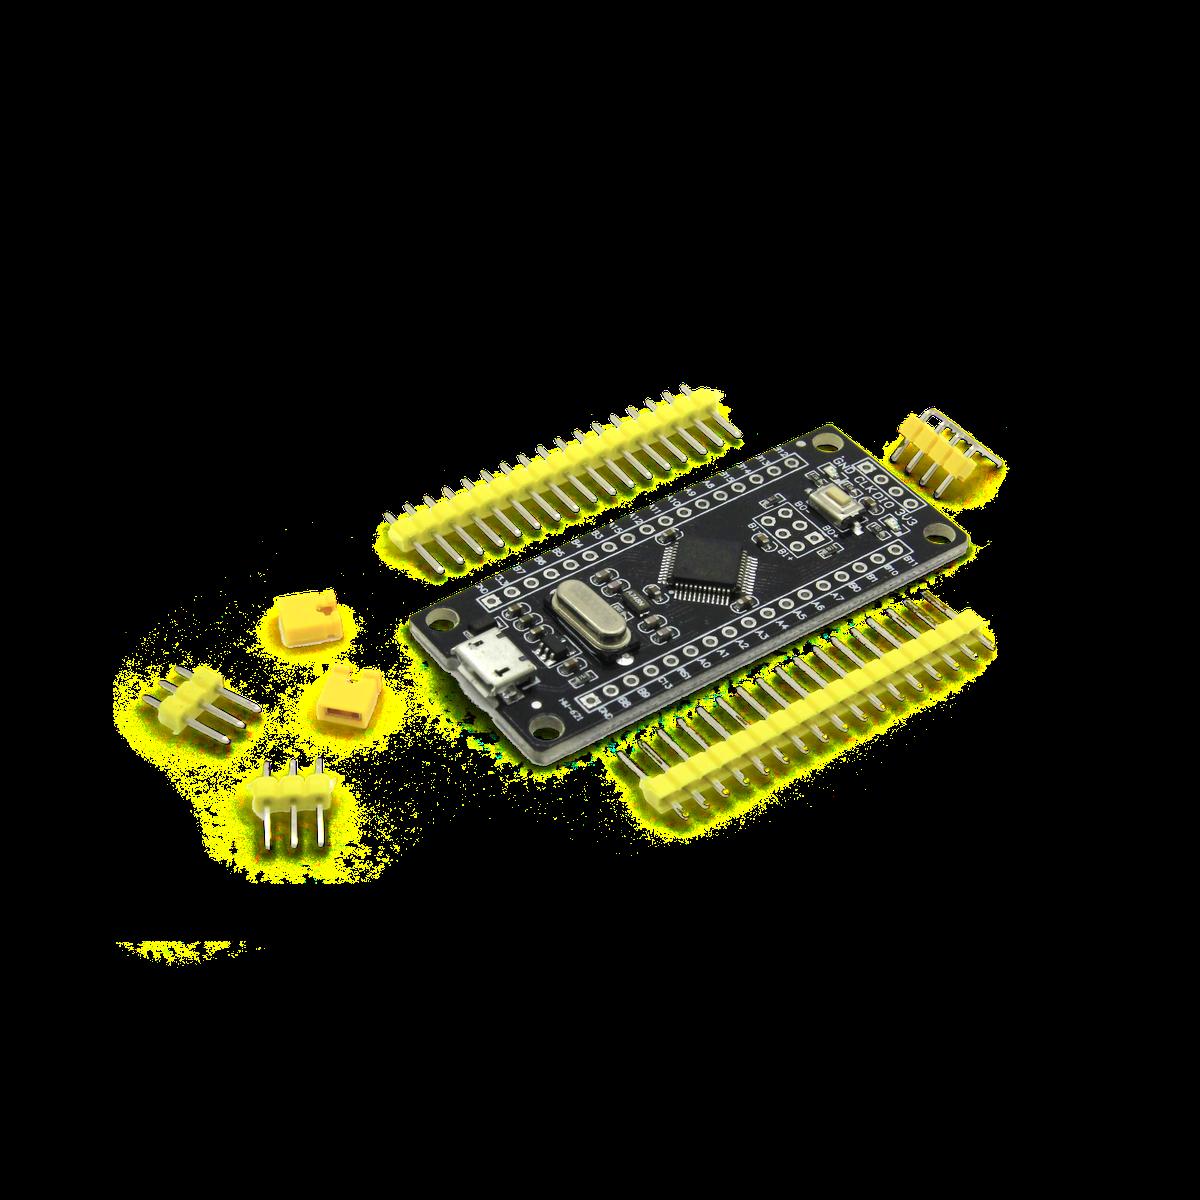 STM32 Black Pill ARM Cortex-M3 Microcontroller